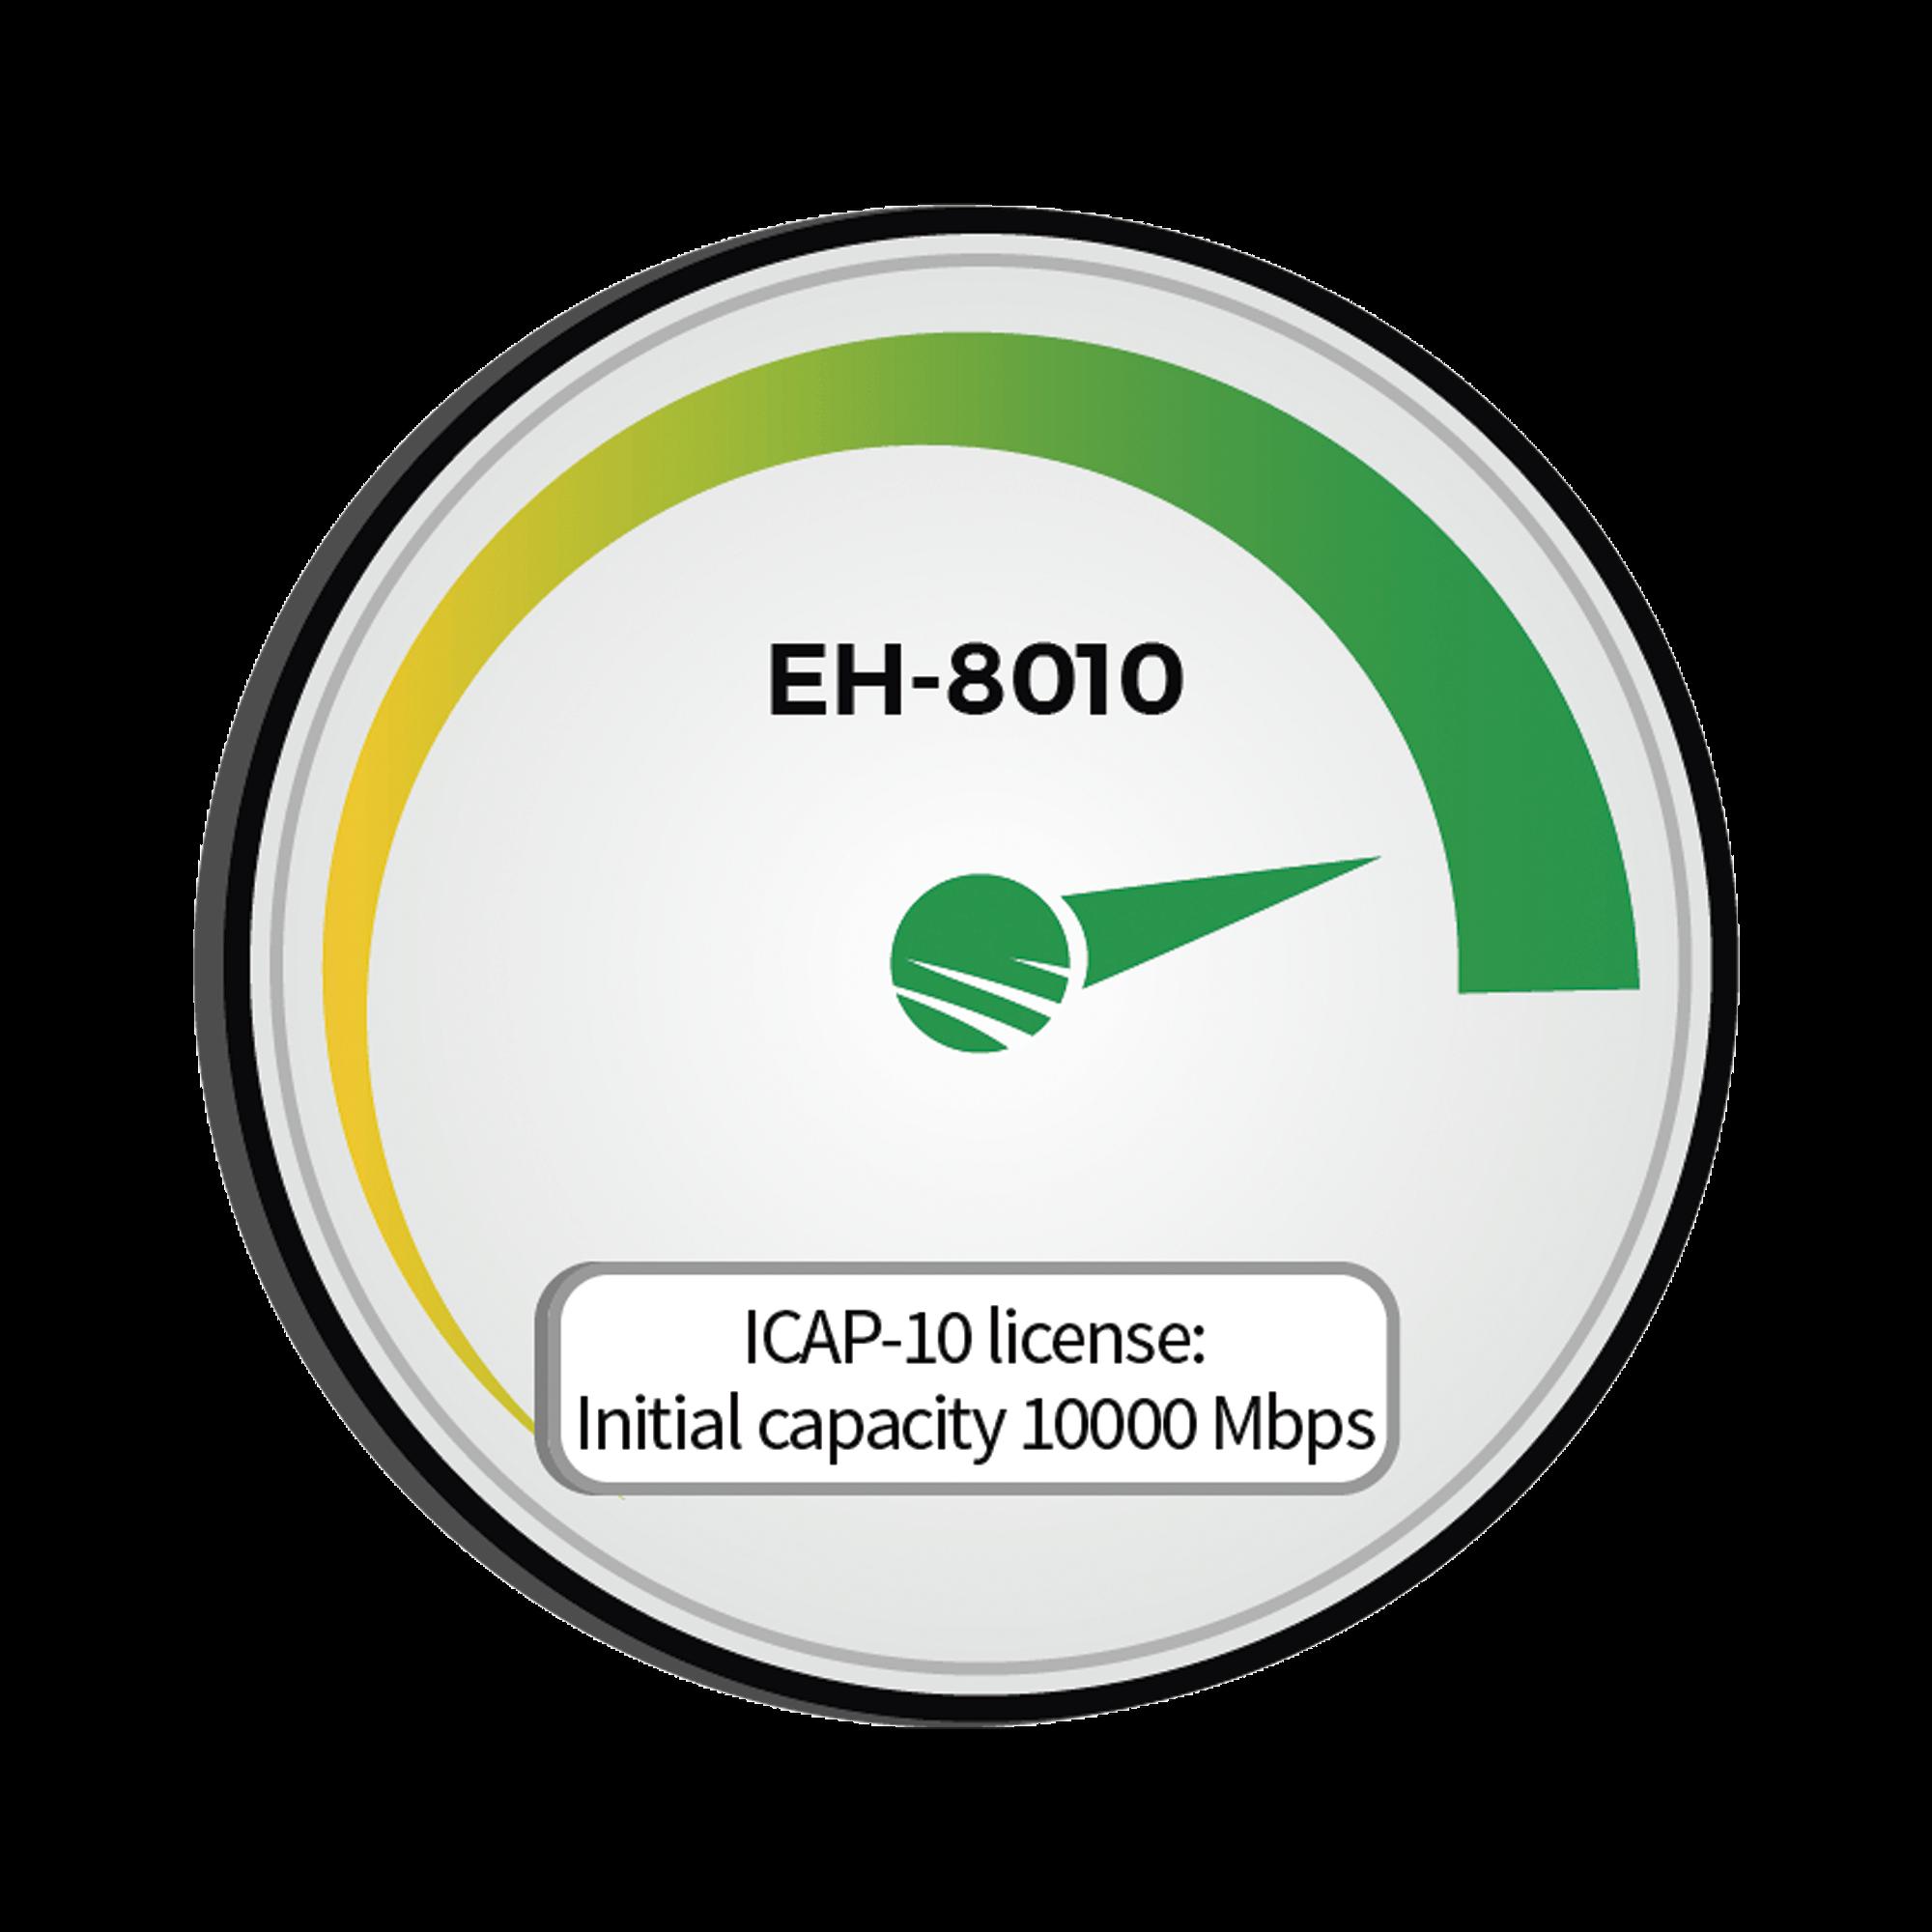 Capacidad inicial 10,000 Mbps (10Gbps) para EH-8010